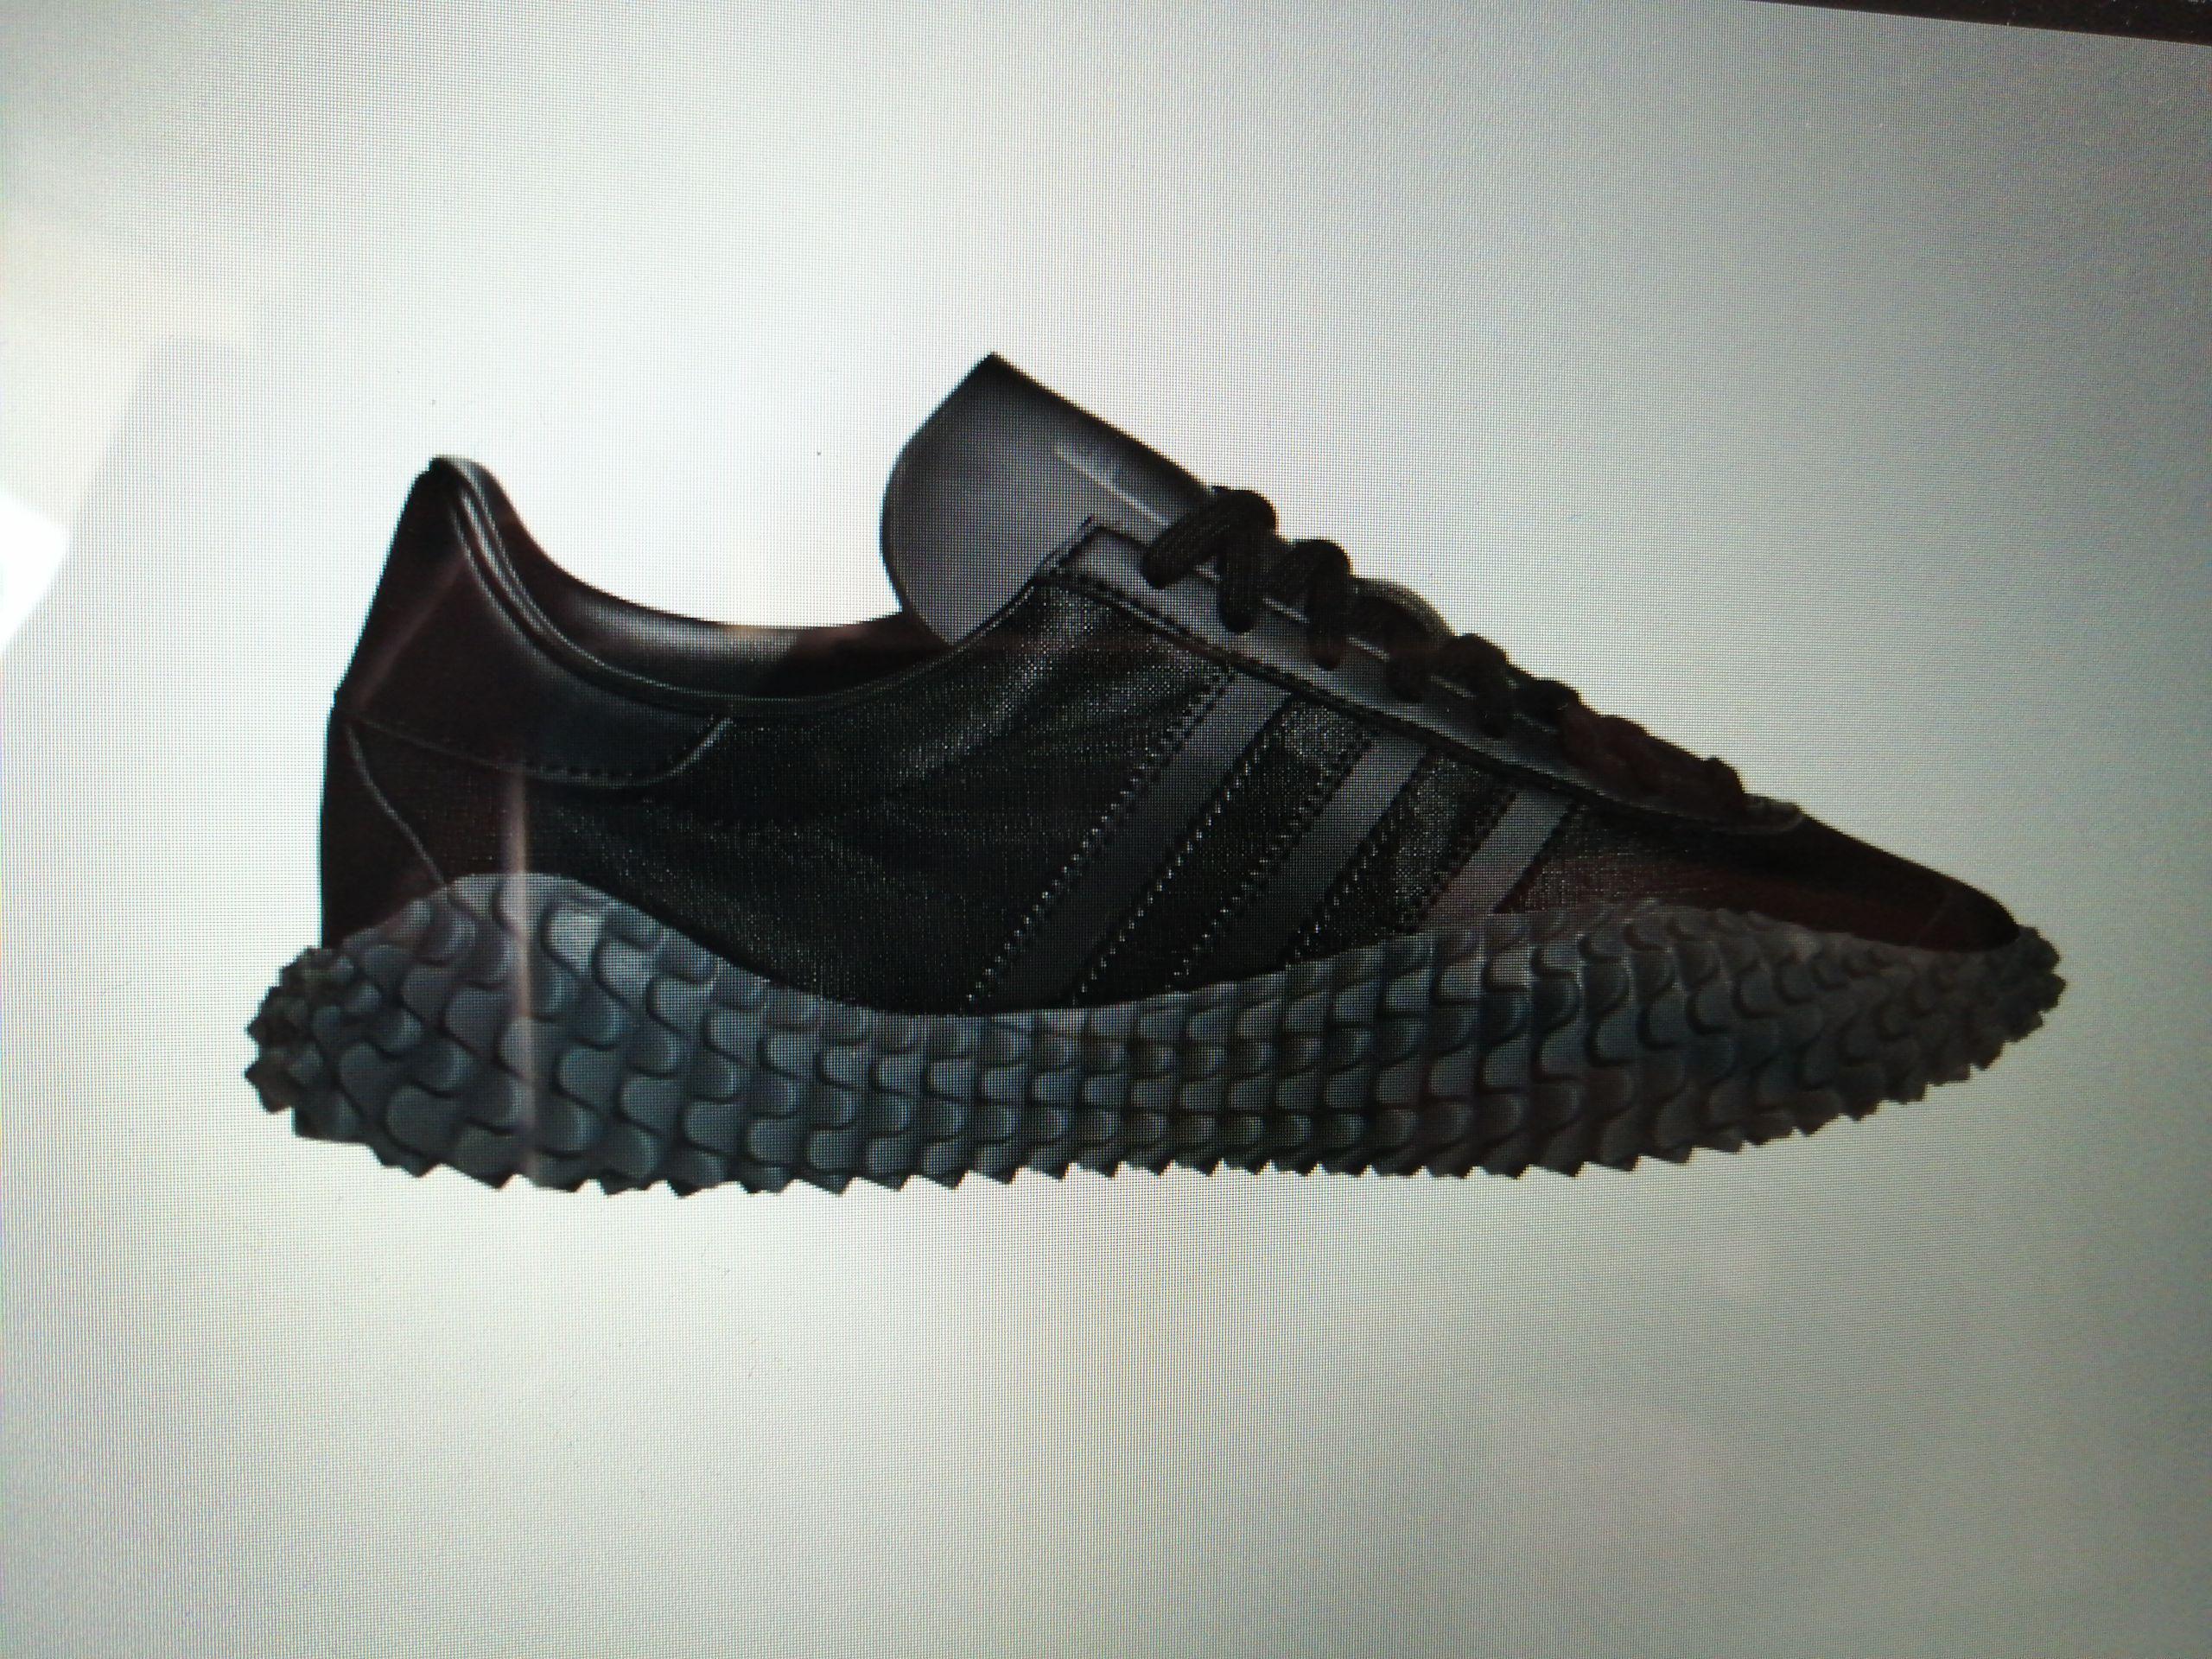 0dc6313e0afff Chaussures Adidas Country X Kamanda